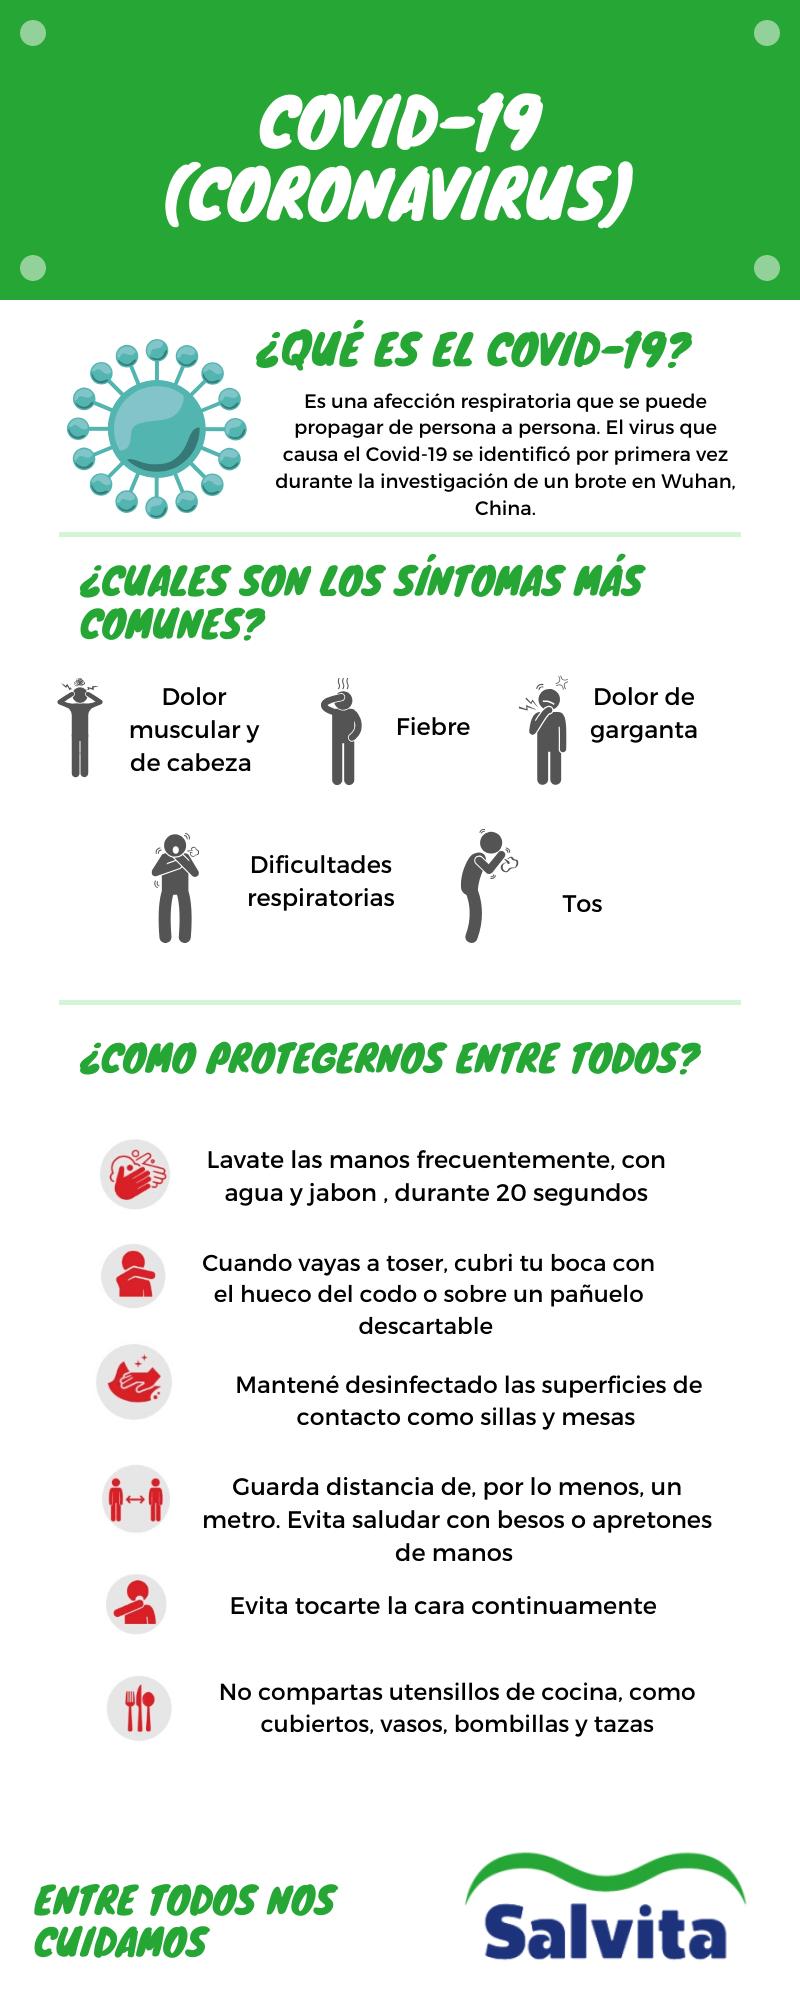 Salvita Alimentos • COVID-19 (coronavirus)